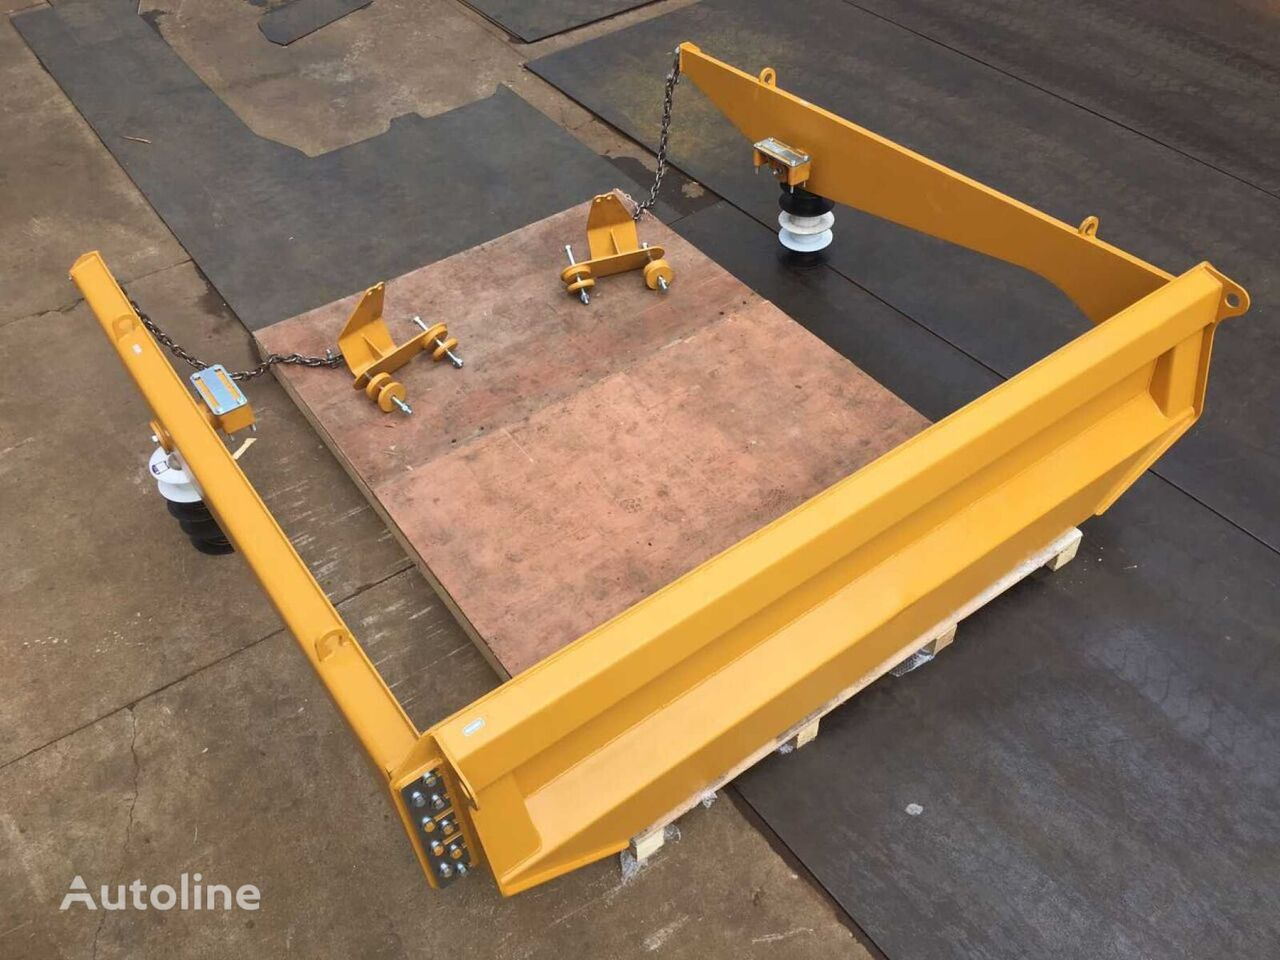 nowe oblicowanie TAILGATE KIT do dostawczego varie 730 AGF797-UP